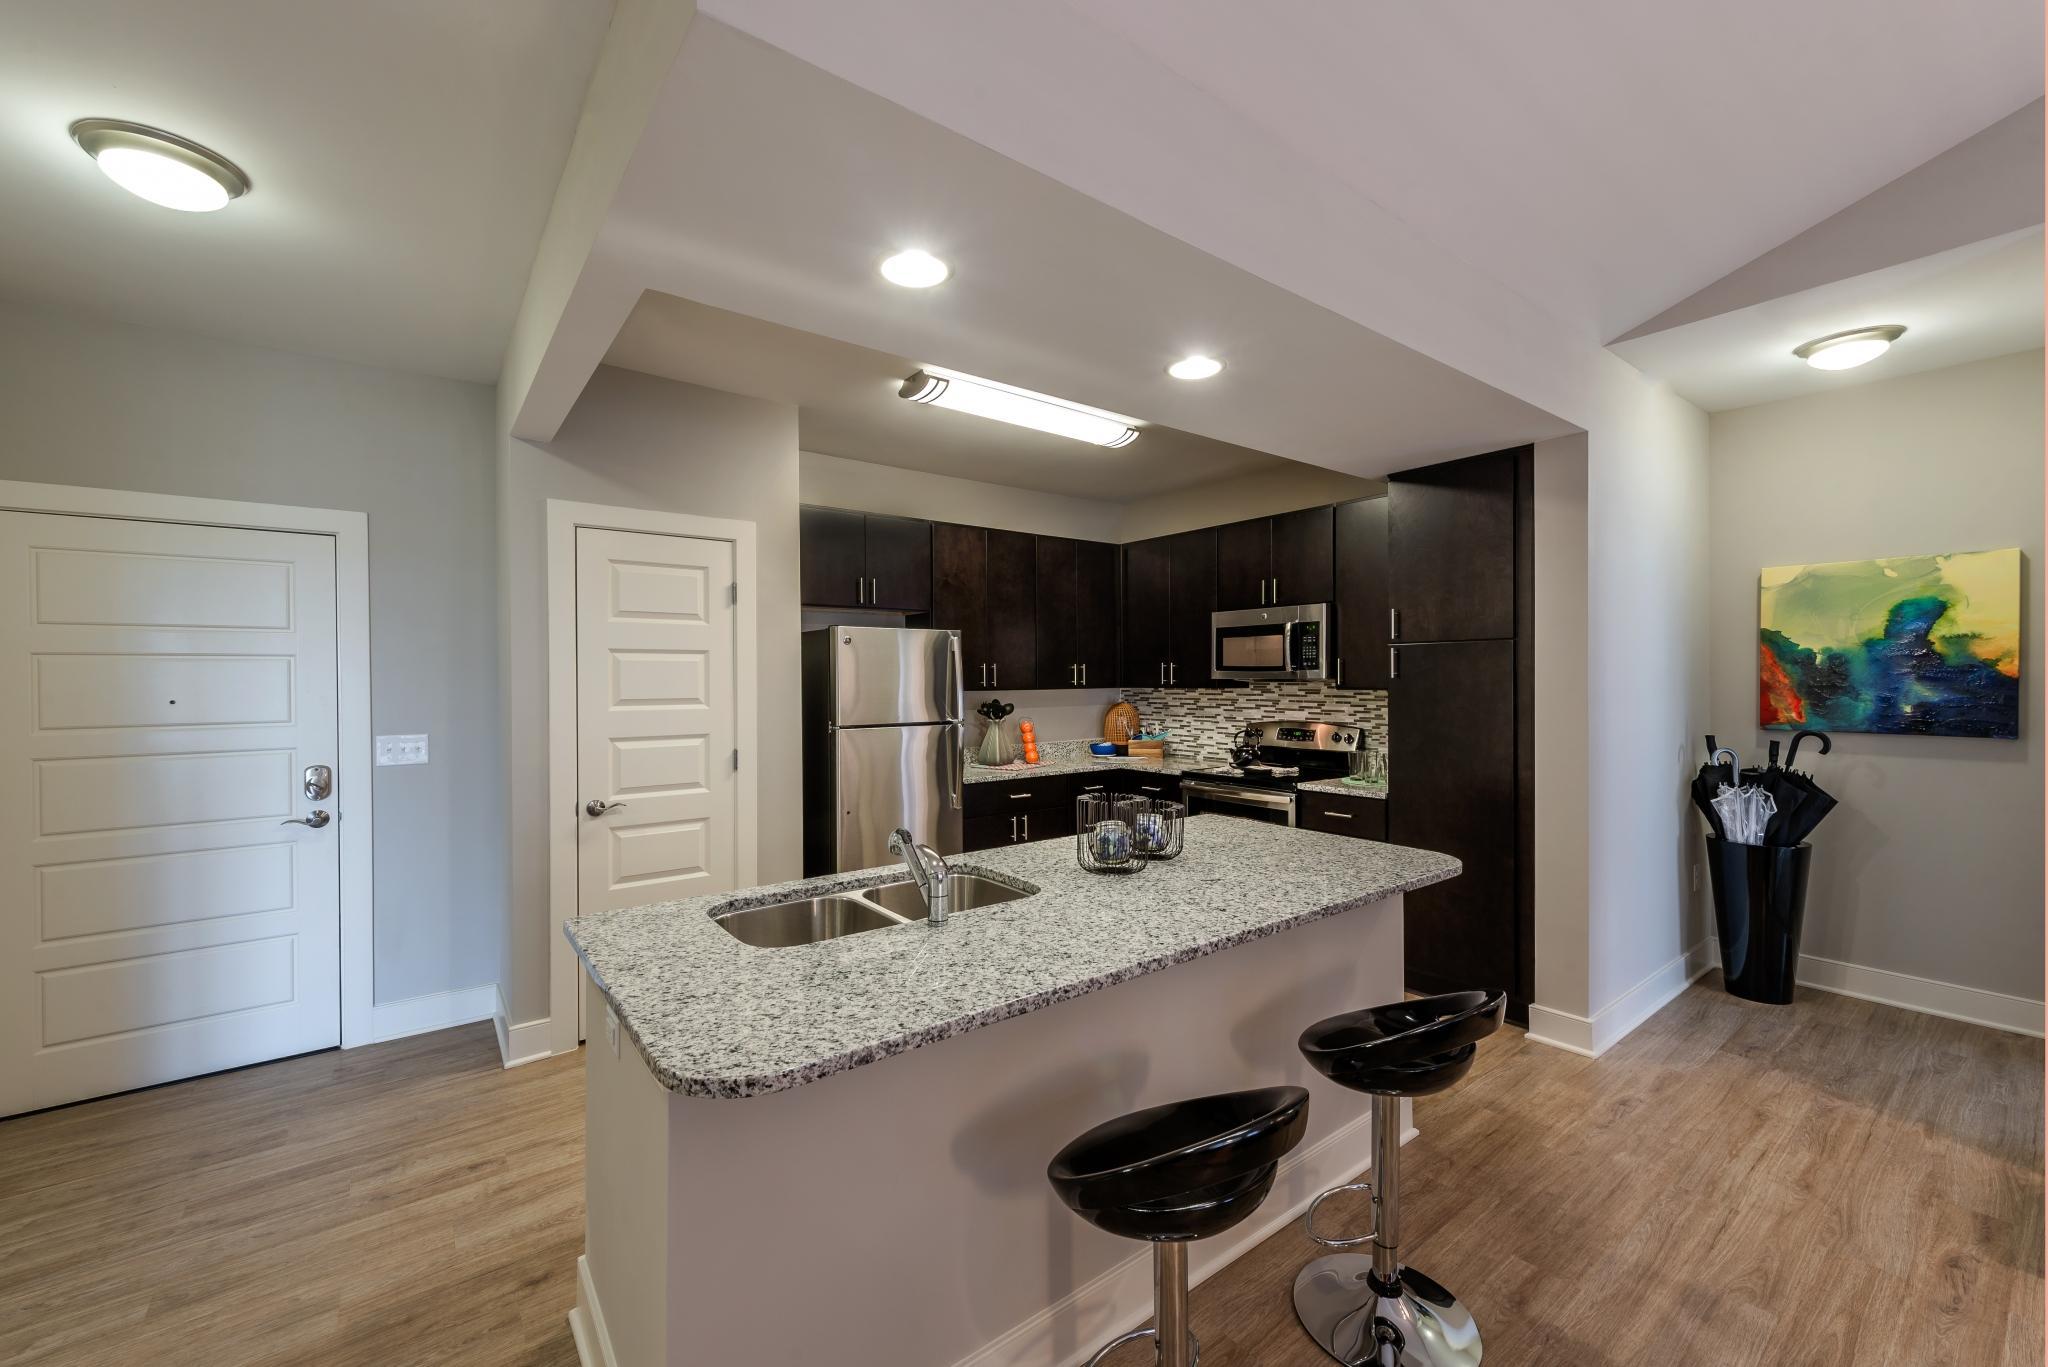 Studio Apartment Virginia Beach 2 bedroom houses for rent in virginia beach | mattress